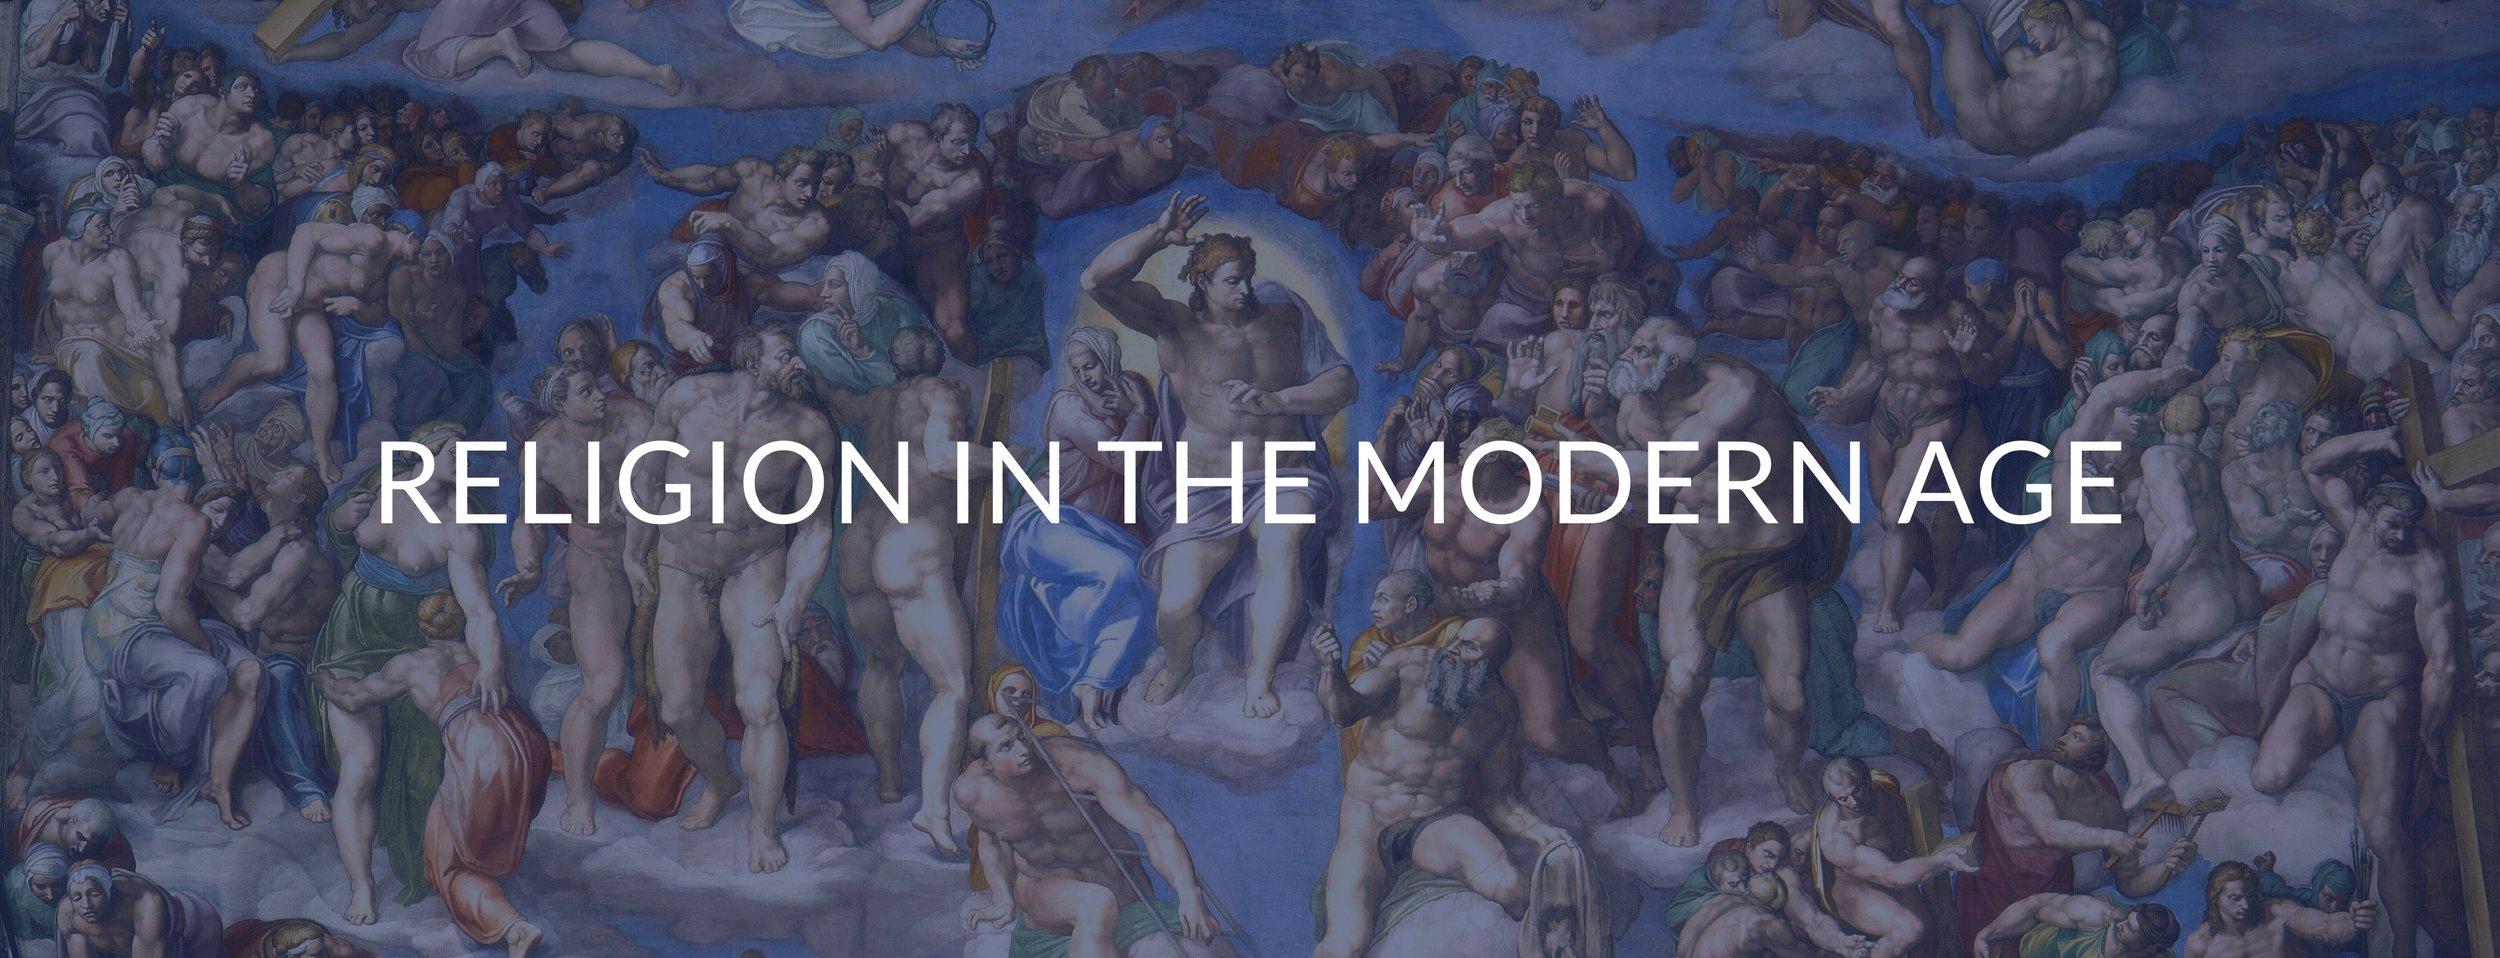 Religion in modern age.jpg